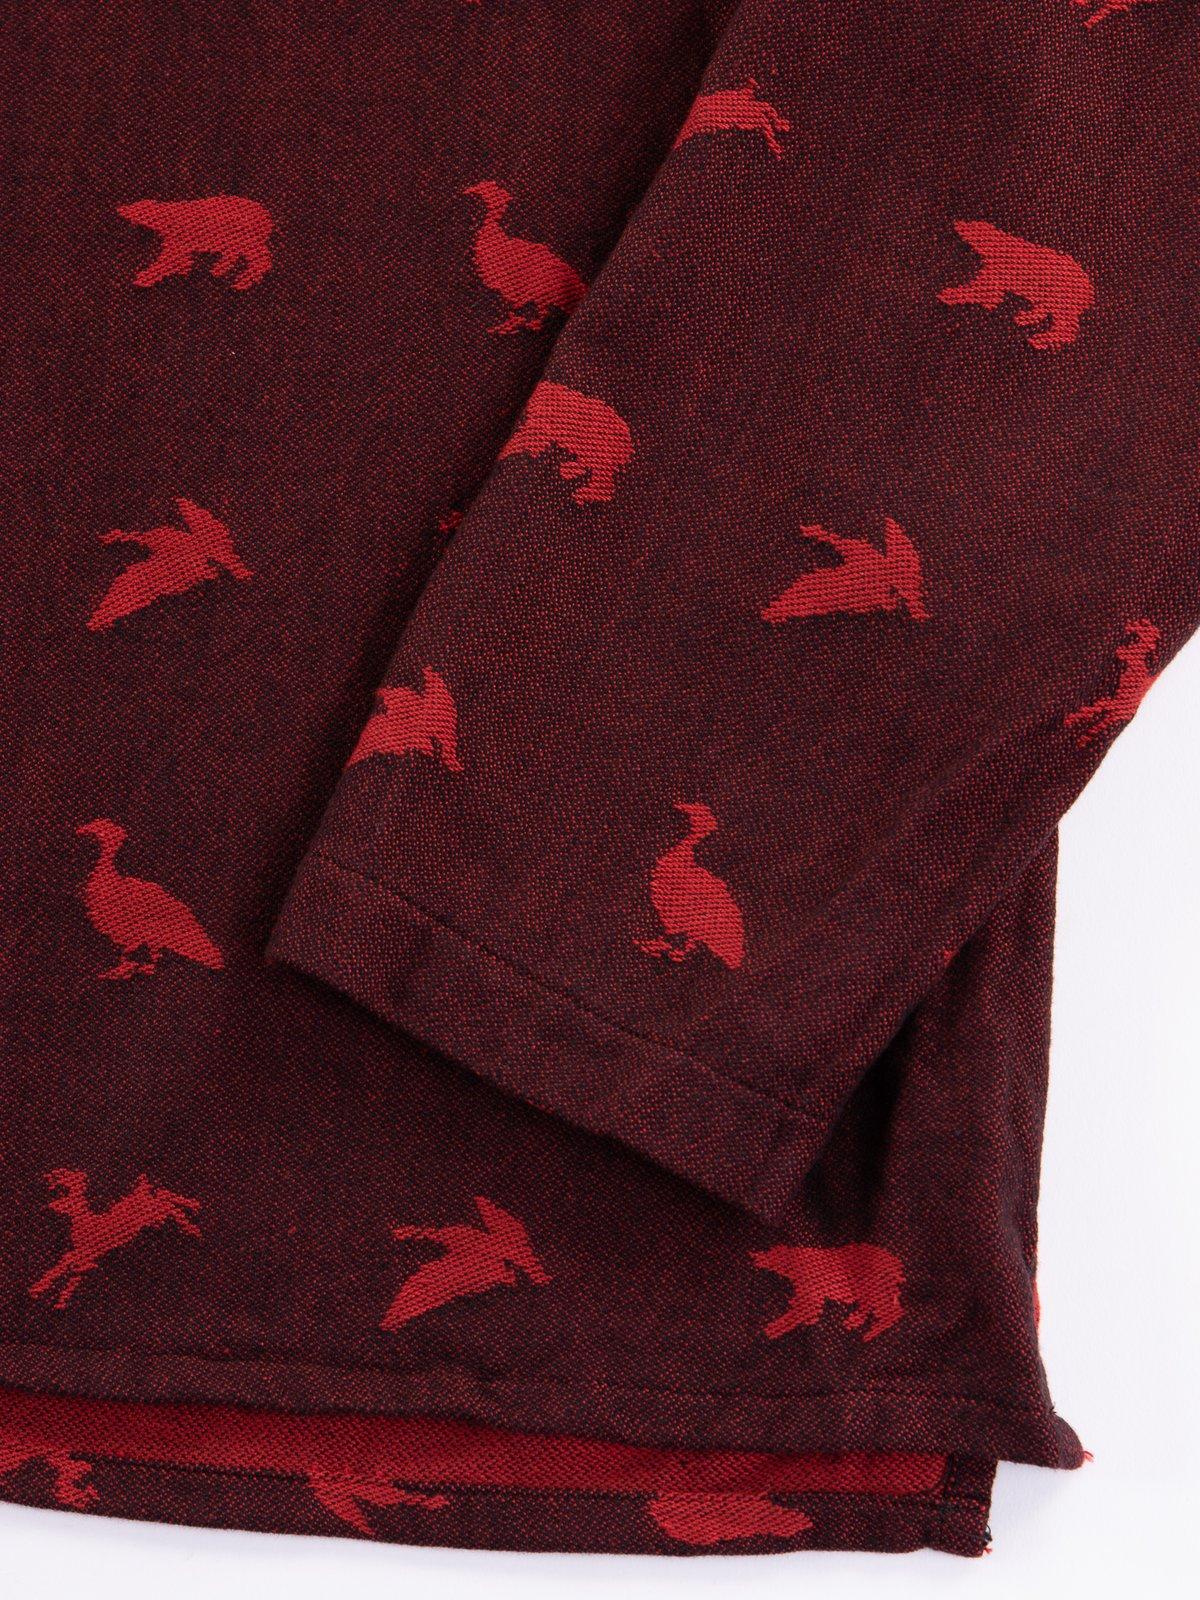 Black/Red Game Animal Jacquard MED Shirt - Image 4